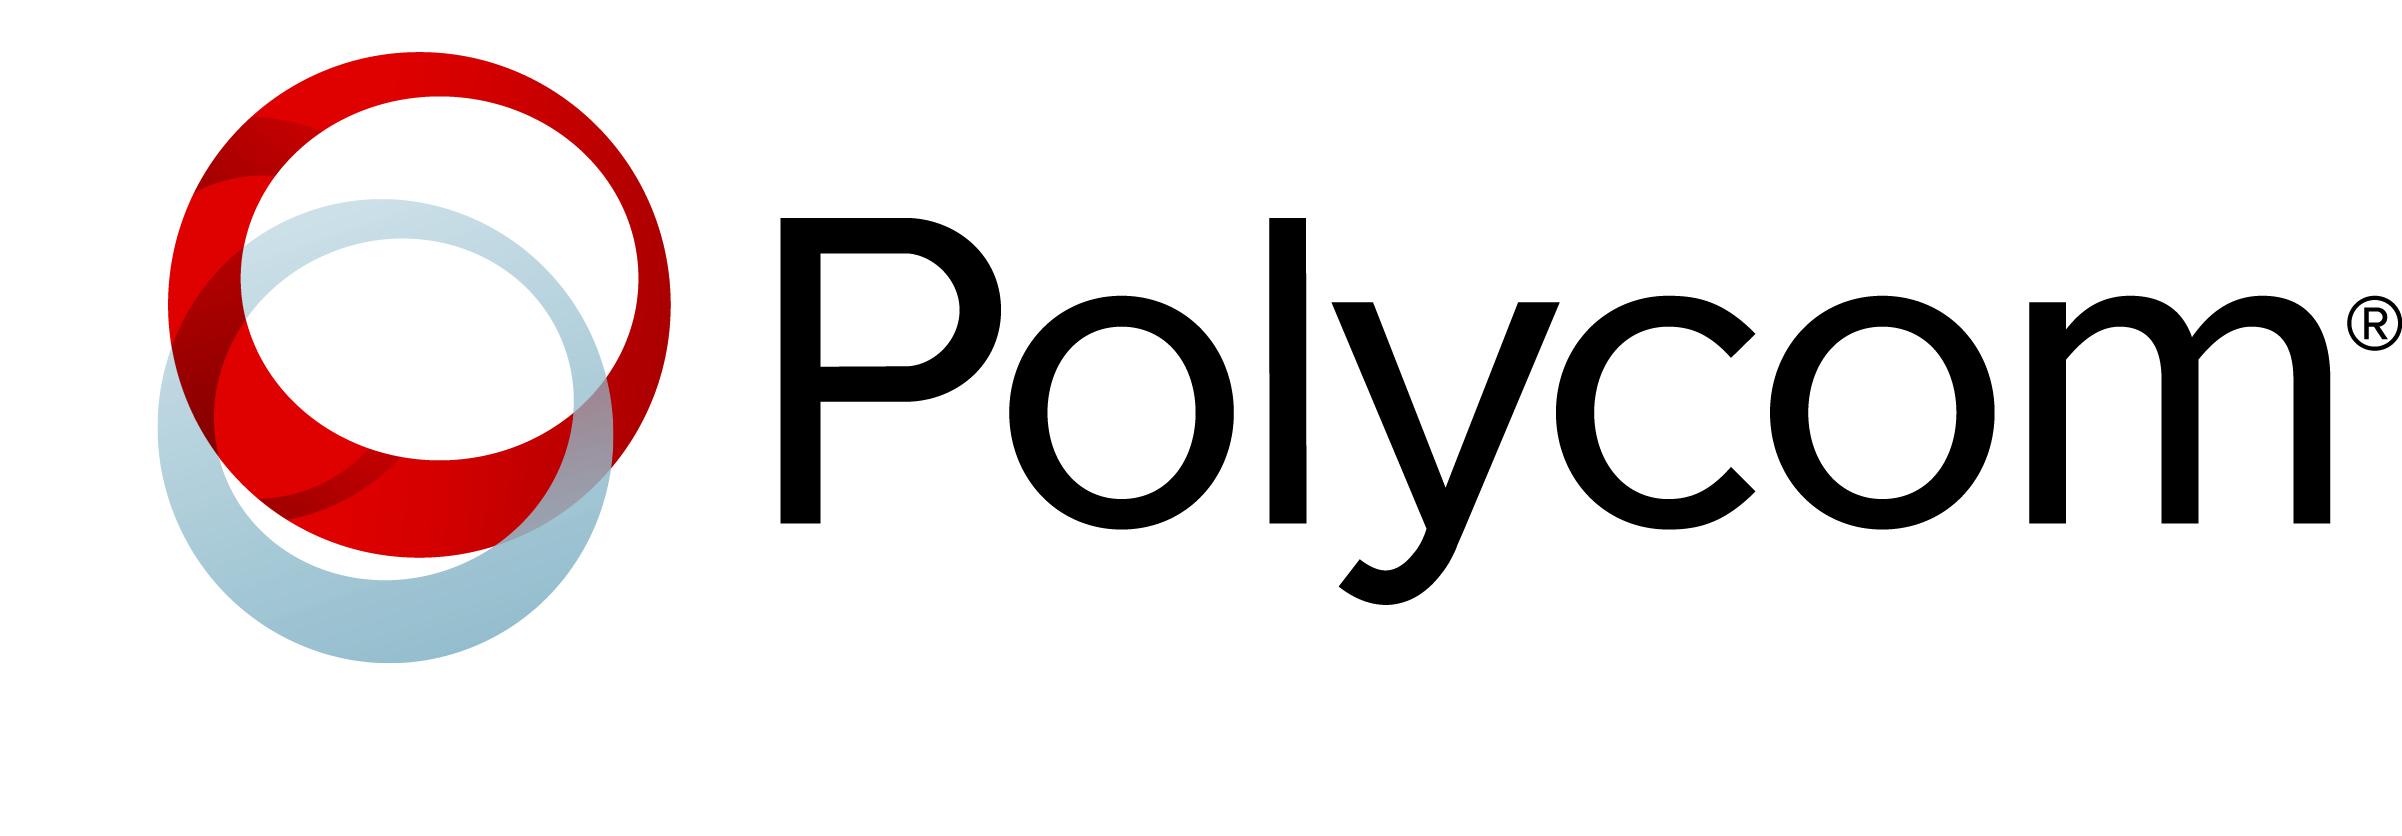 Polycom - Zoom connector